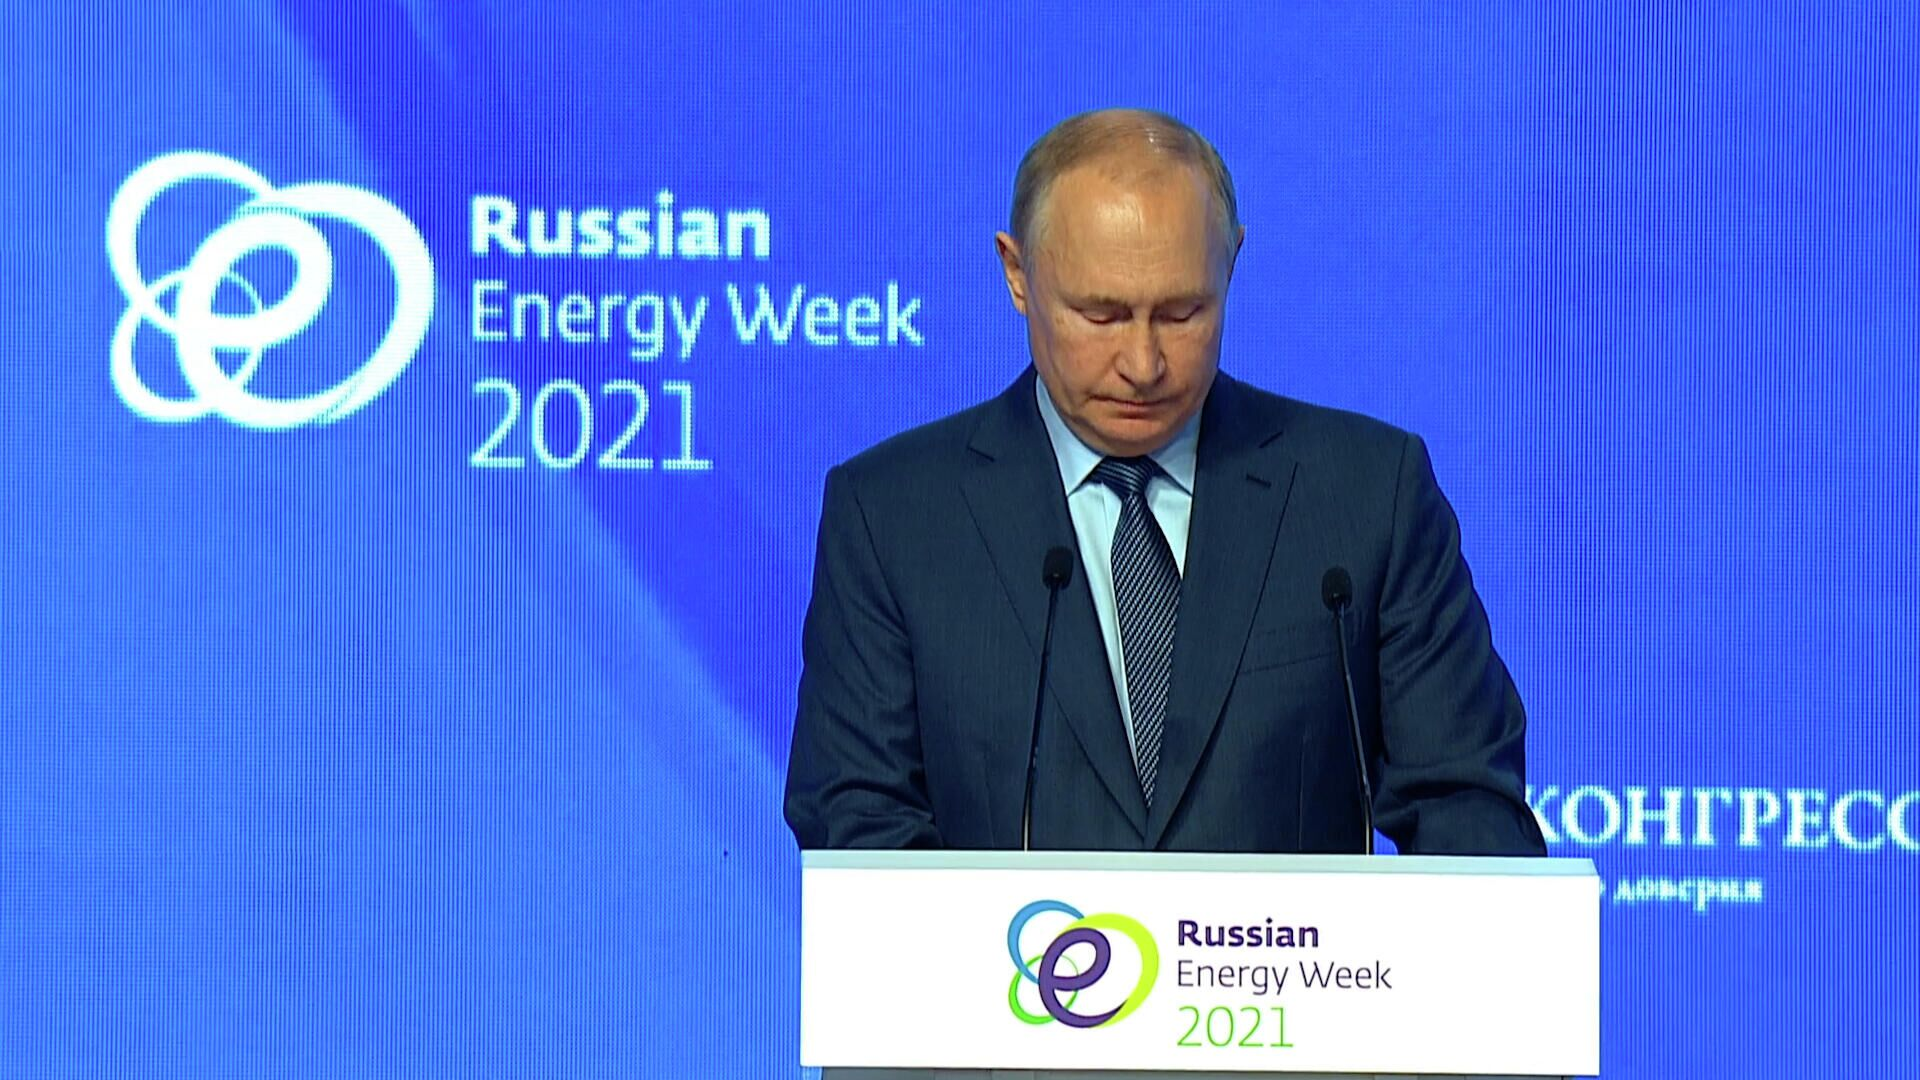 Путин: Рост цен на газ в Европе стал следствием дефицита электроэнергии, а не наоборот - РИА Новости, 1920, 13.10.2021